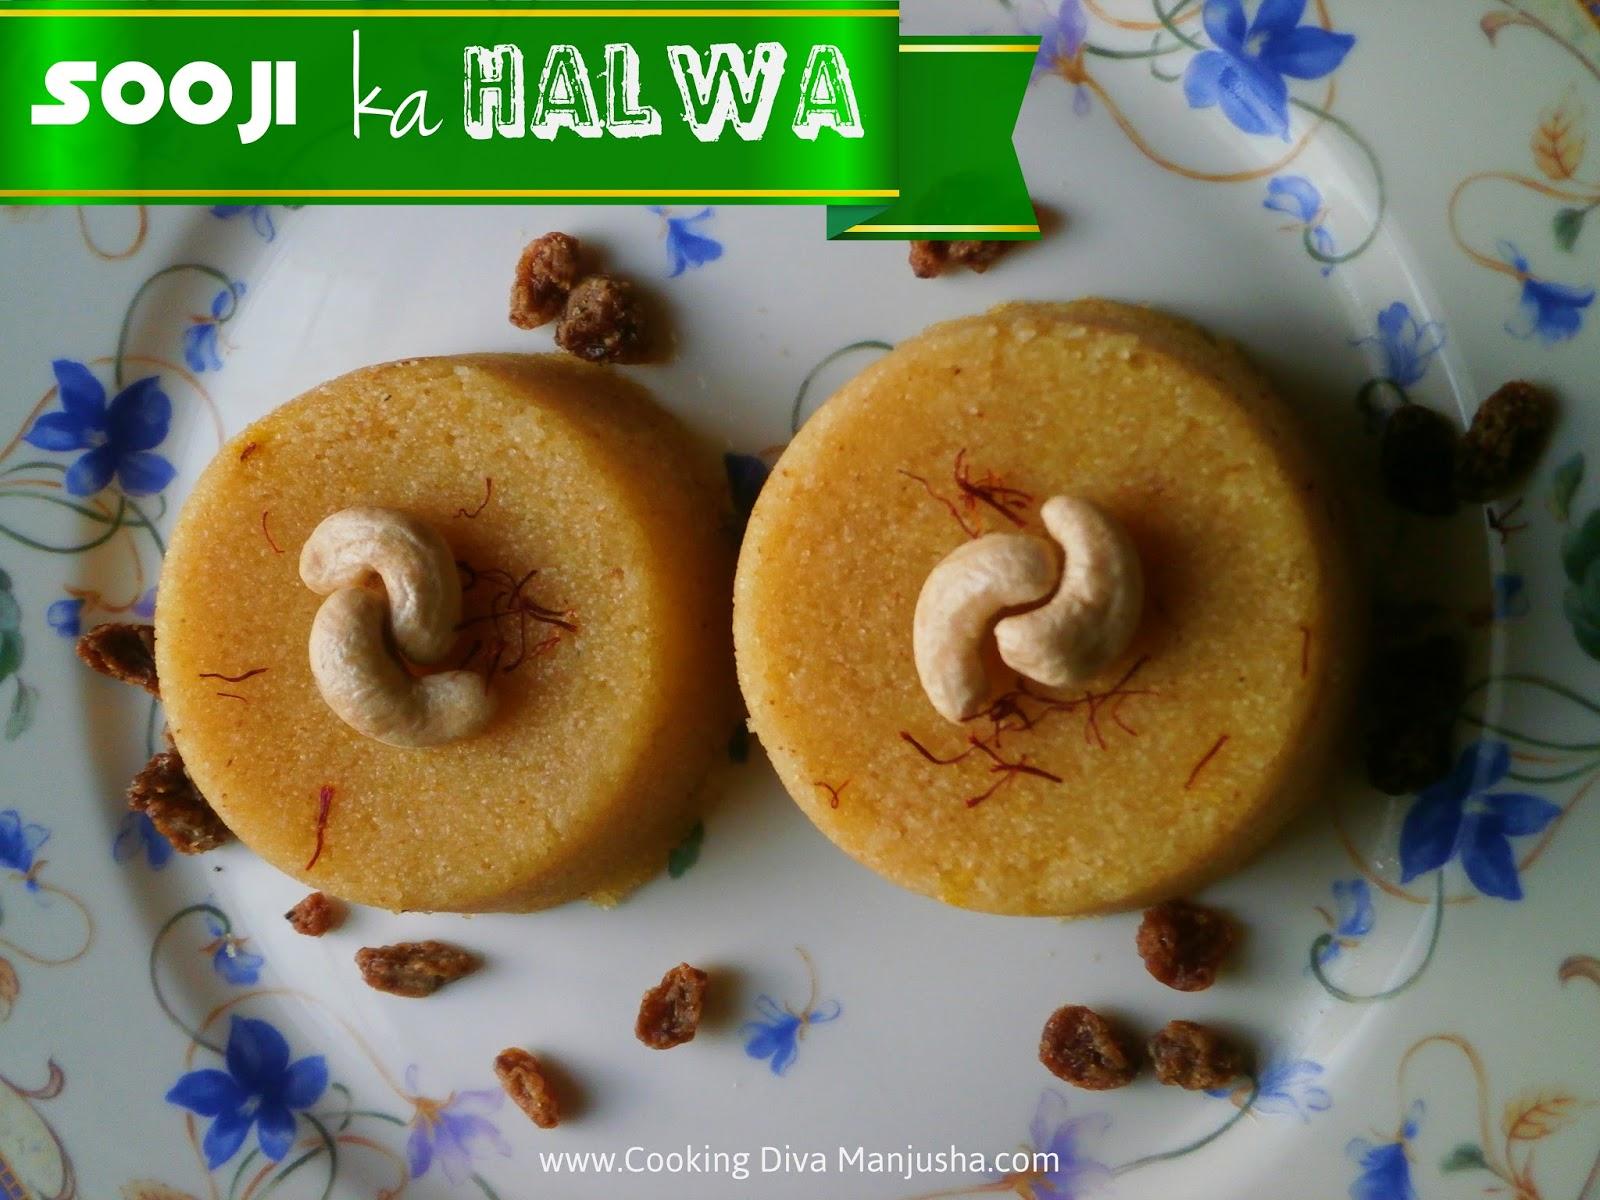 how to prepare sooji halwa